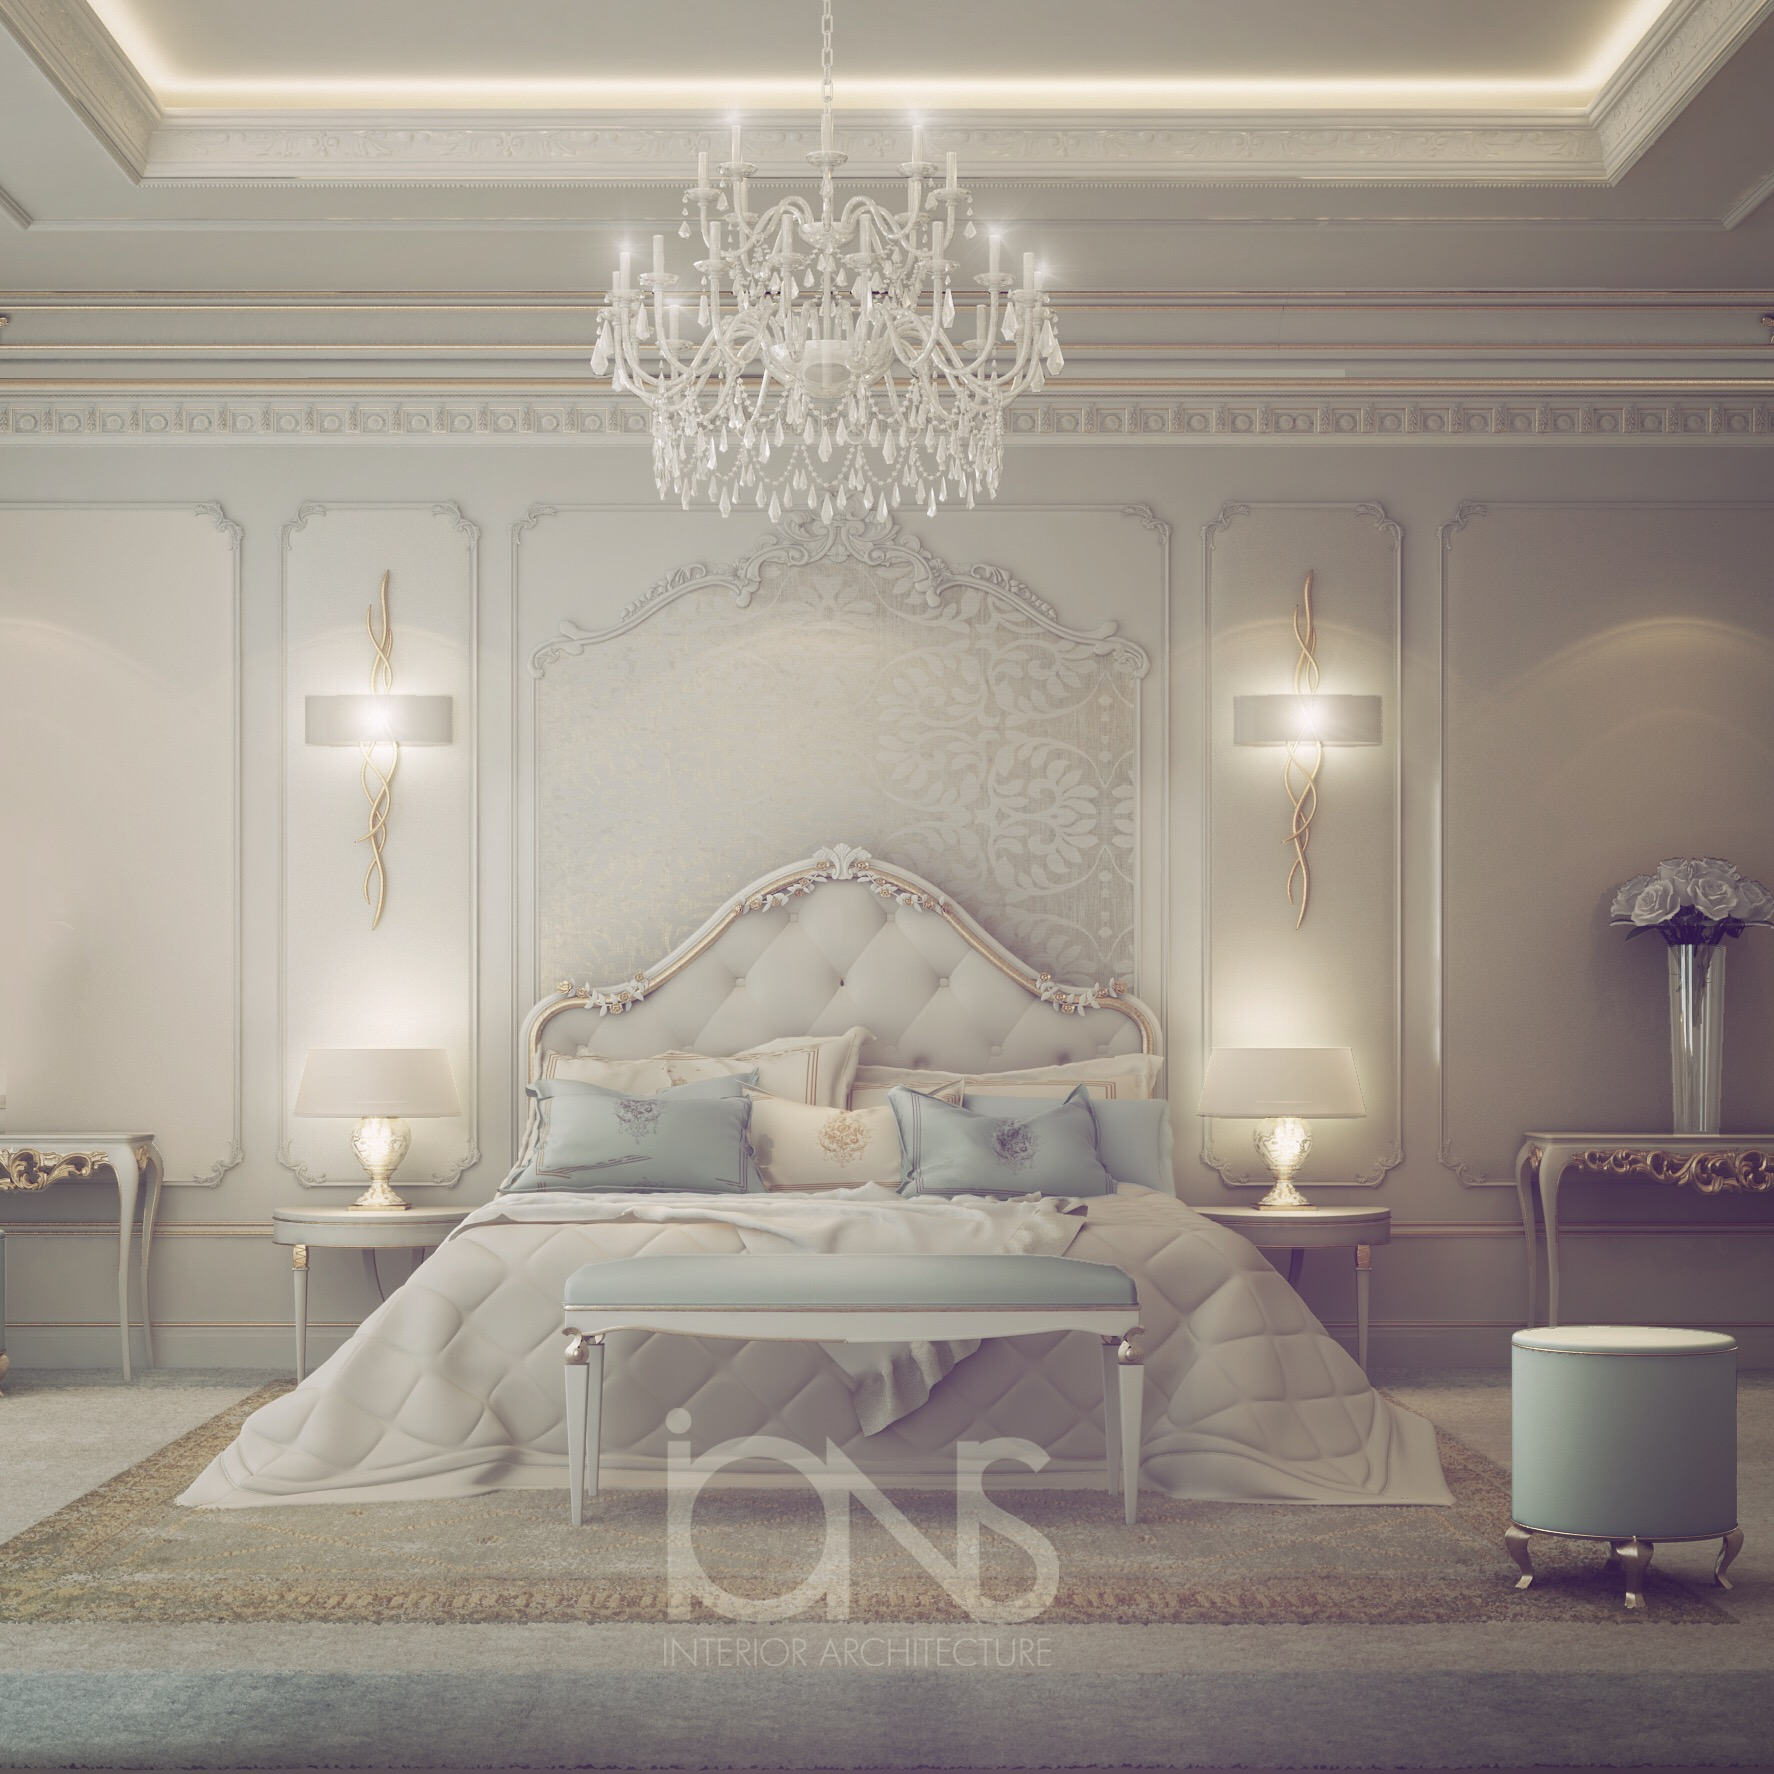 Princess Themed Bedroom Interior